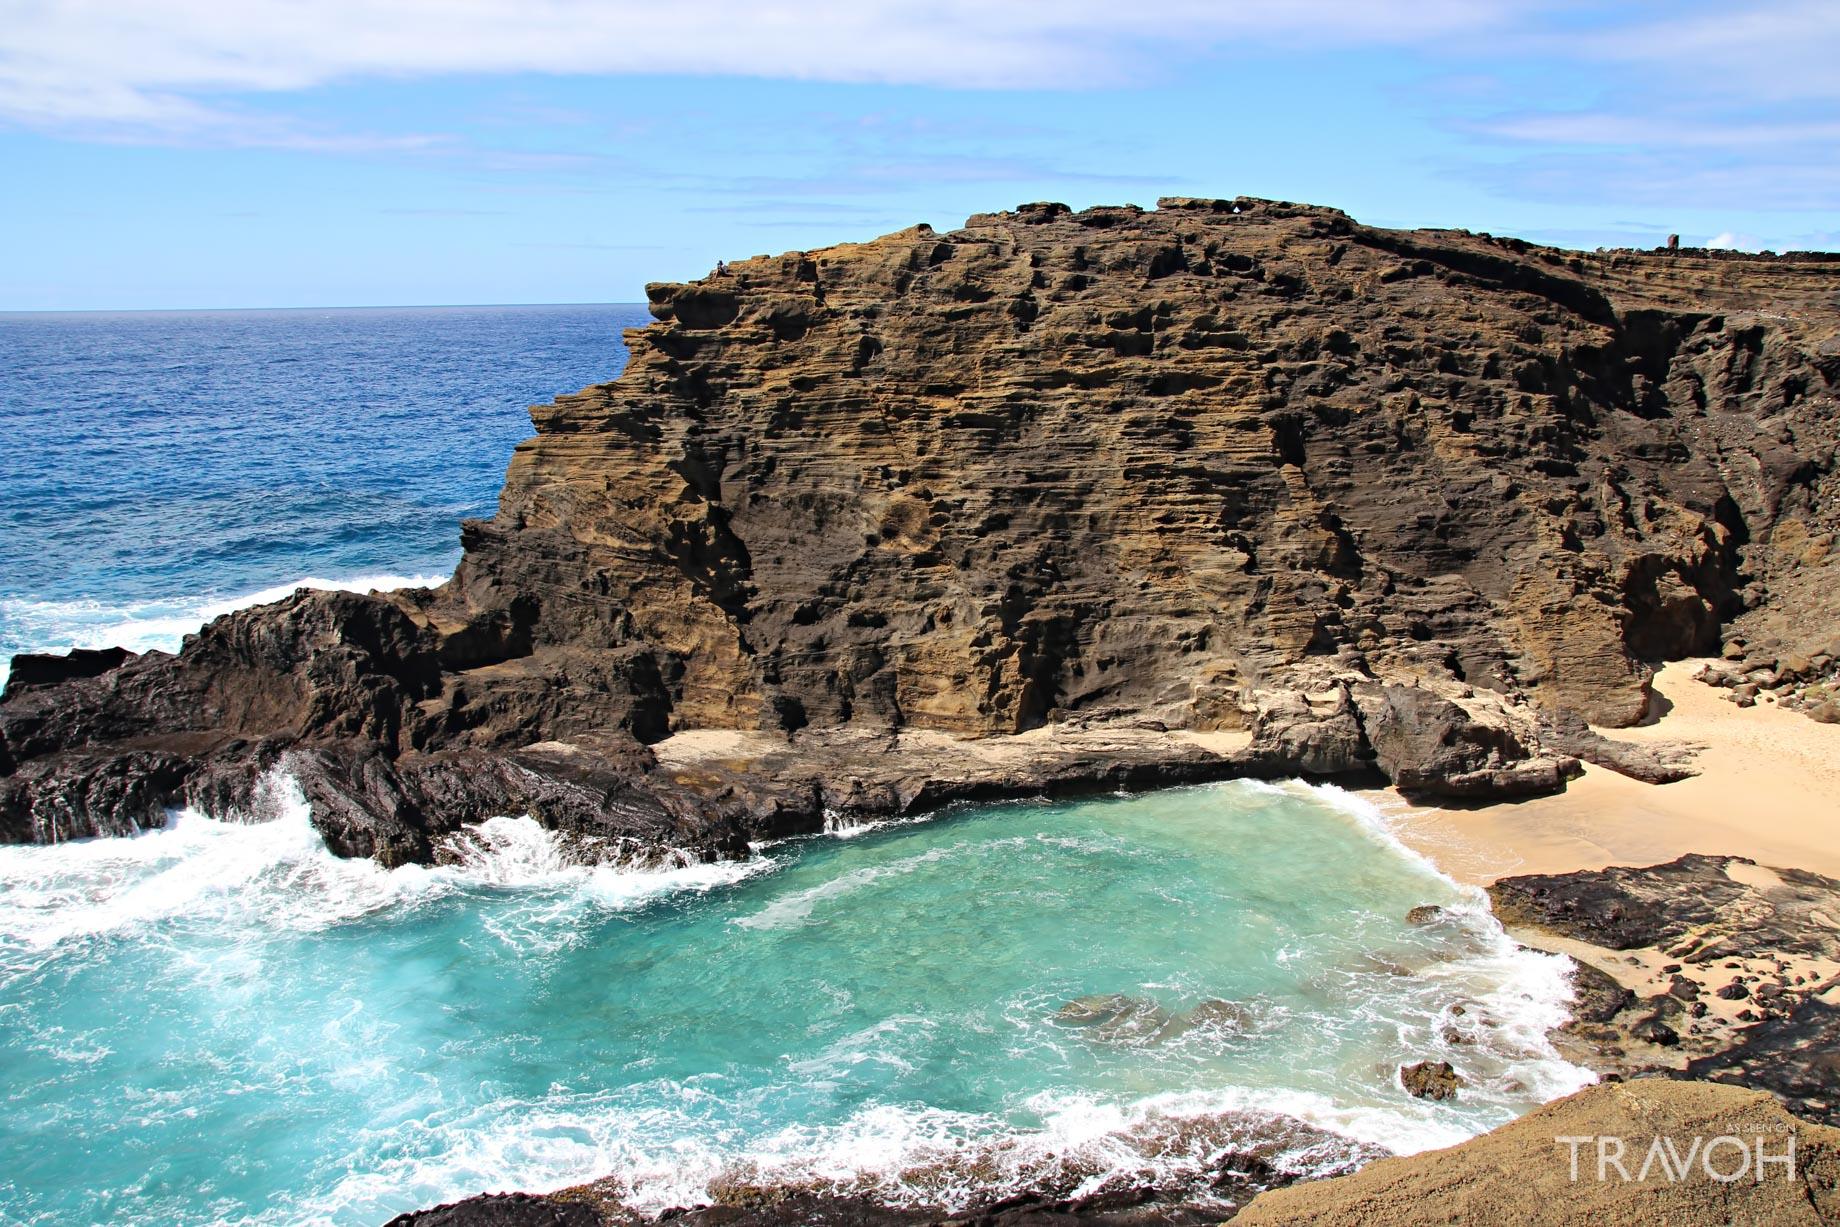 Eternity Beach at Halona Cove - Oahu, Hawaii